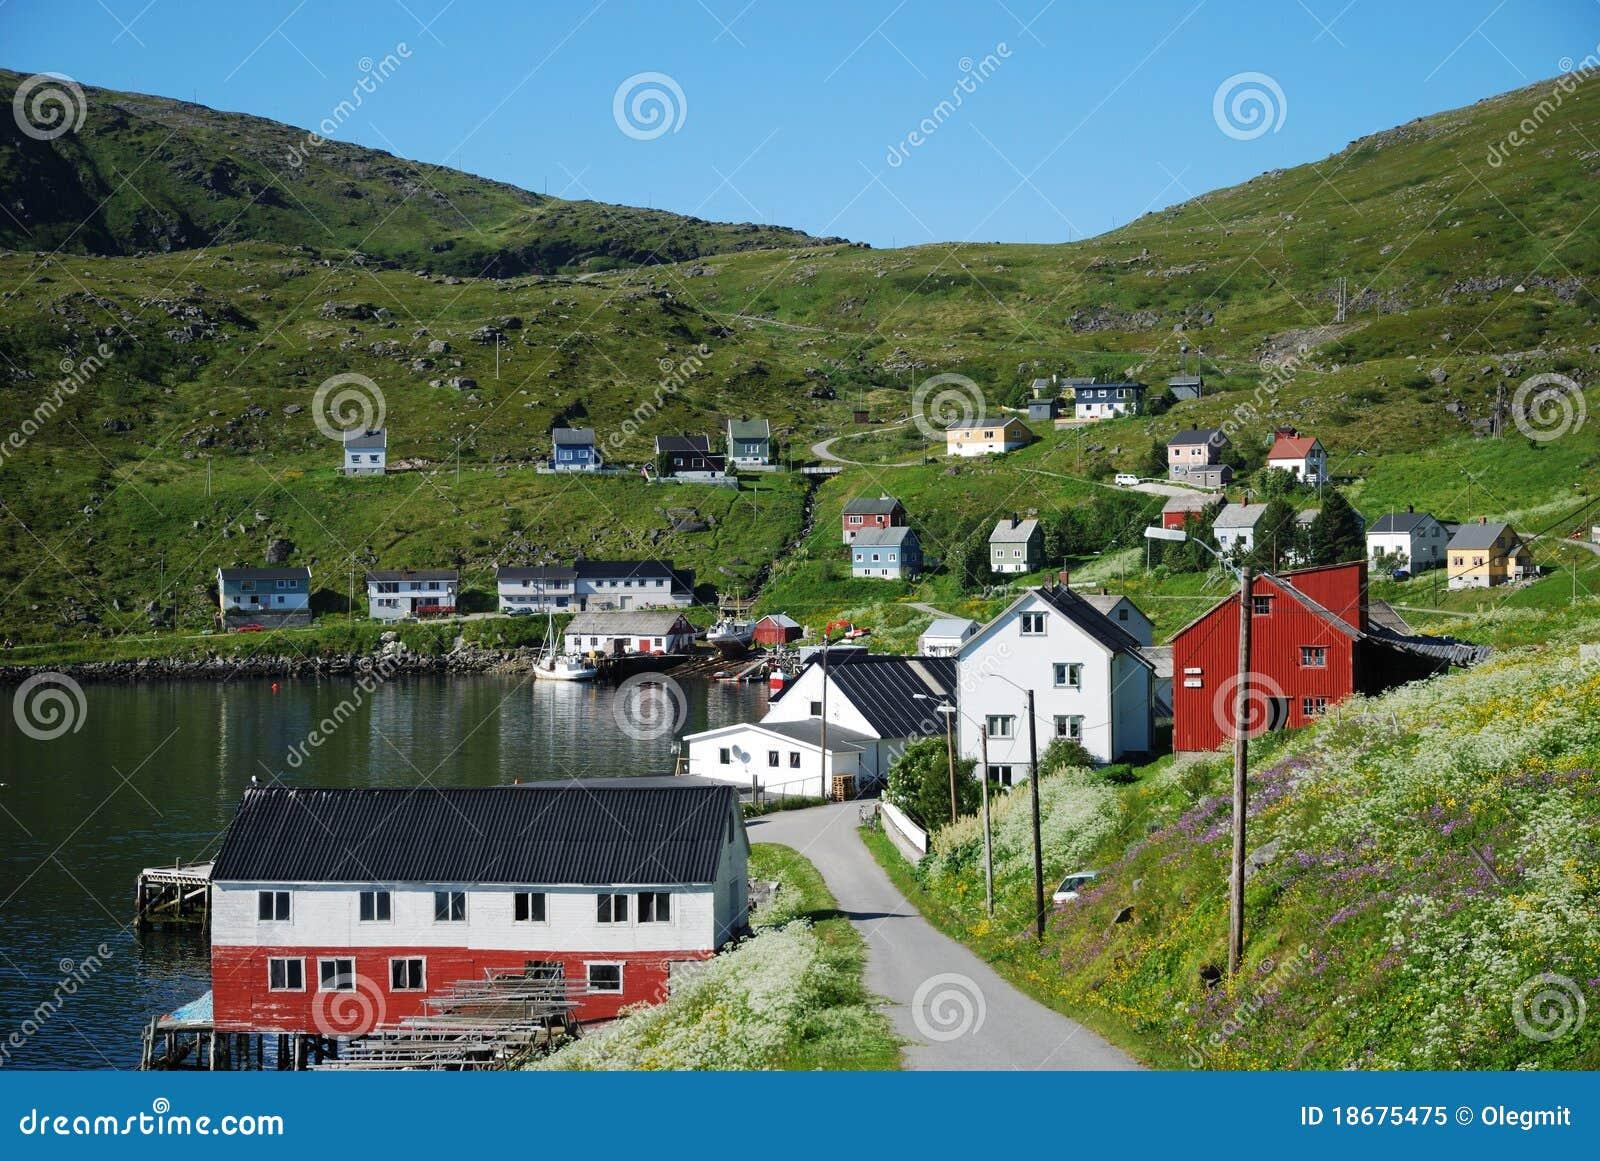 Summer View Of Fishing Village Akkarfjord Royalty Free Stock Photo - Image: 18675475